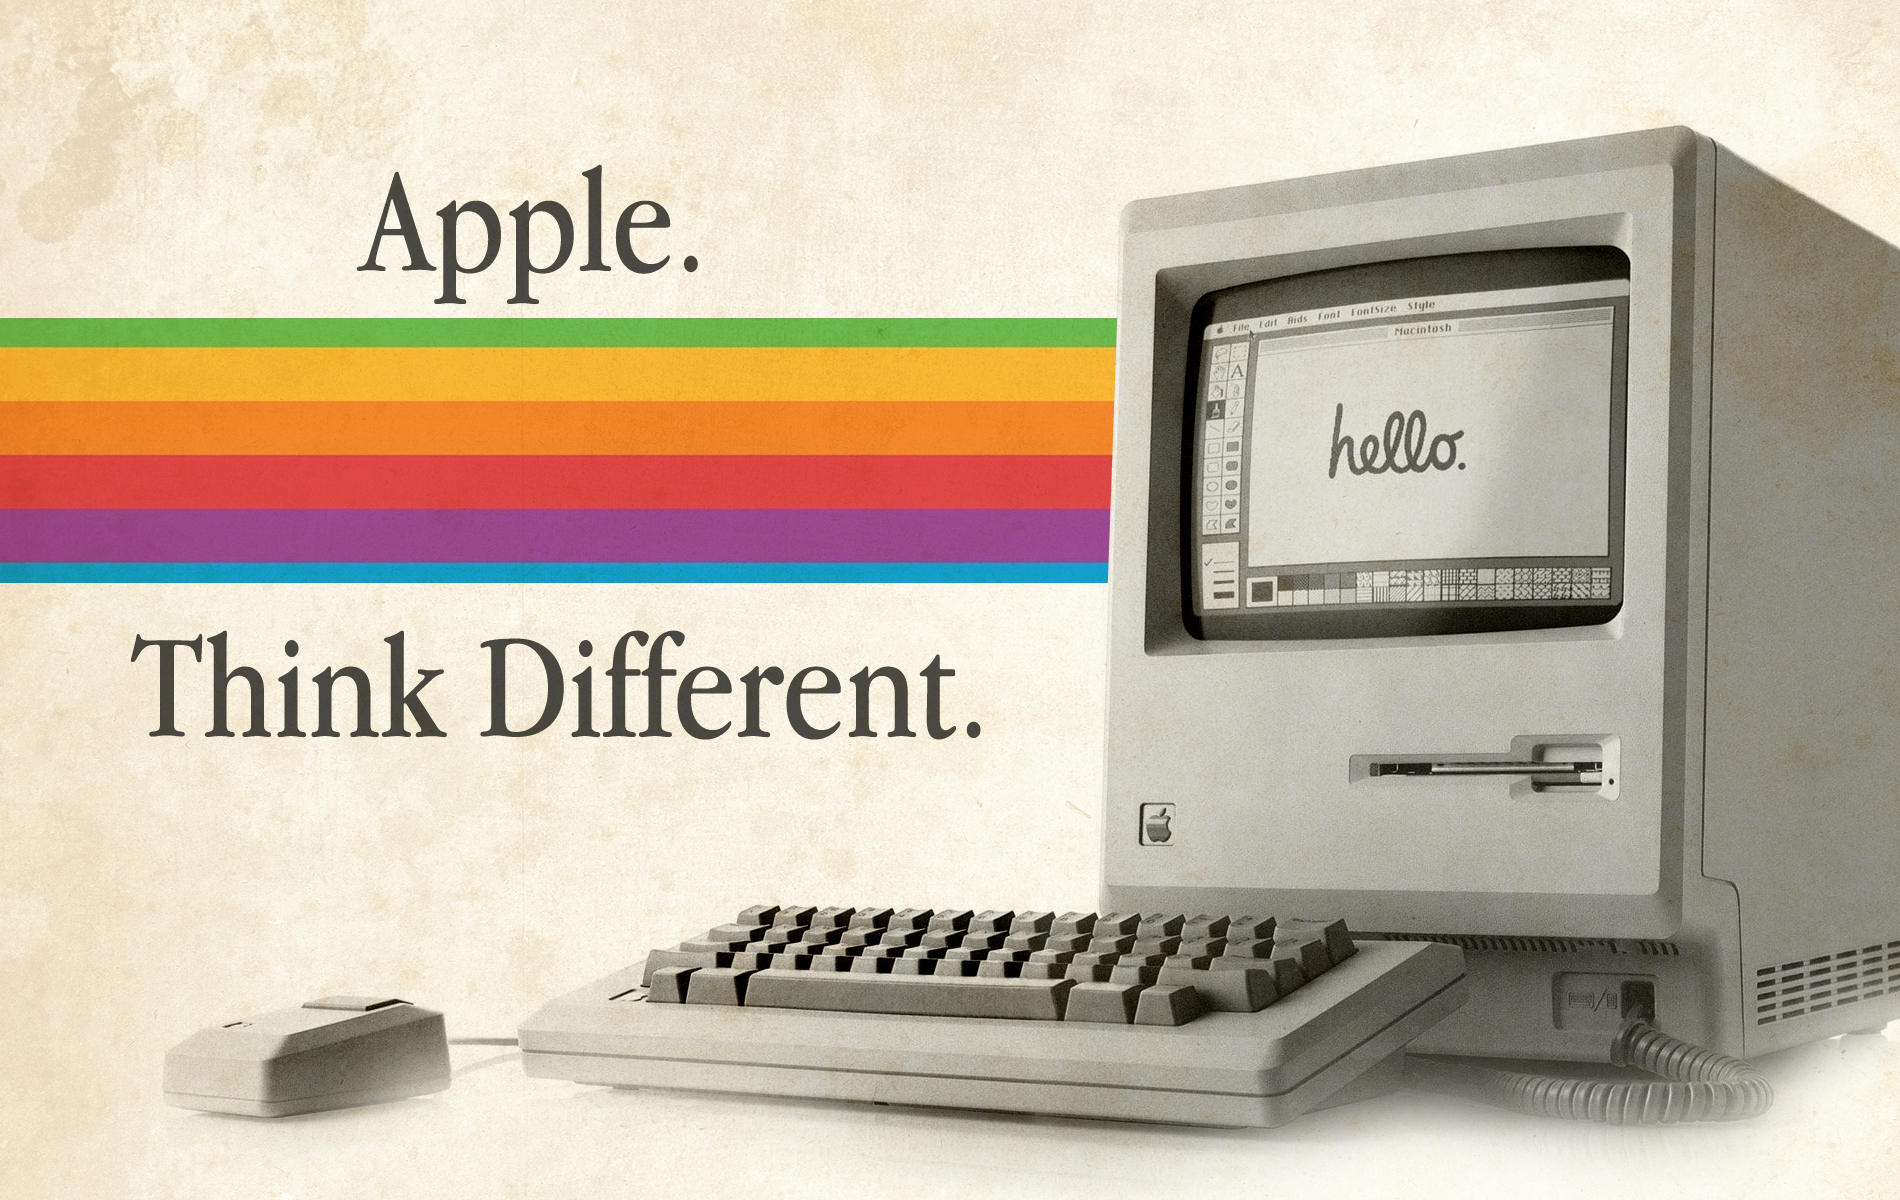 apple think differentdhavalkatrodiya on deviantart